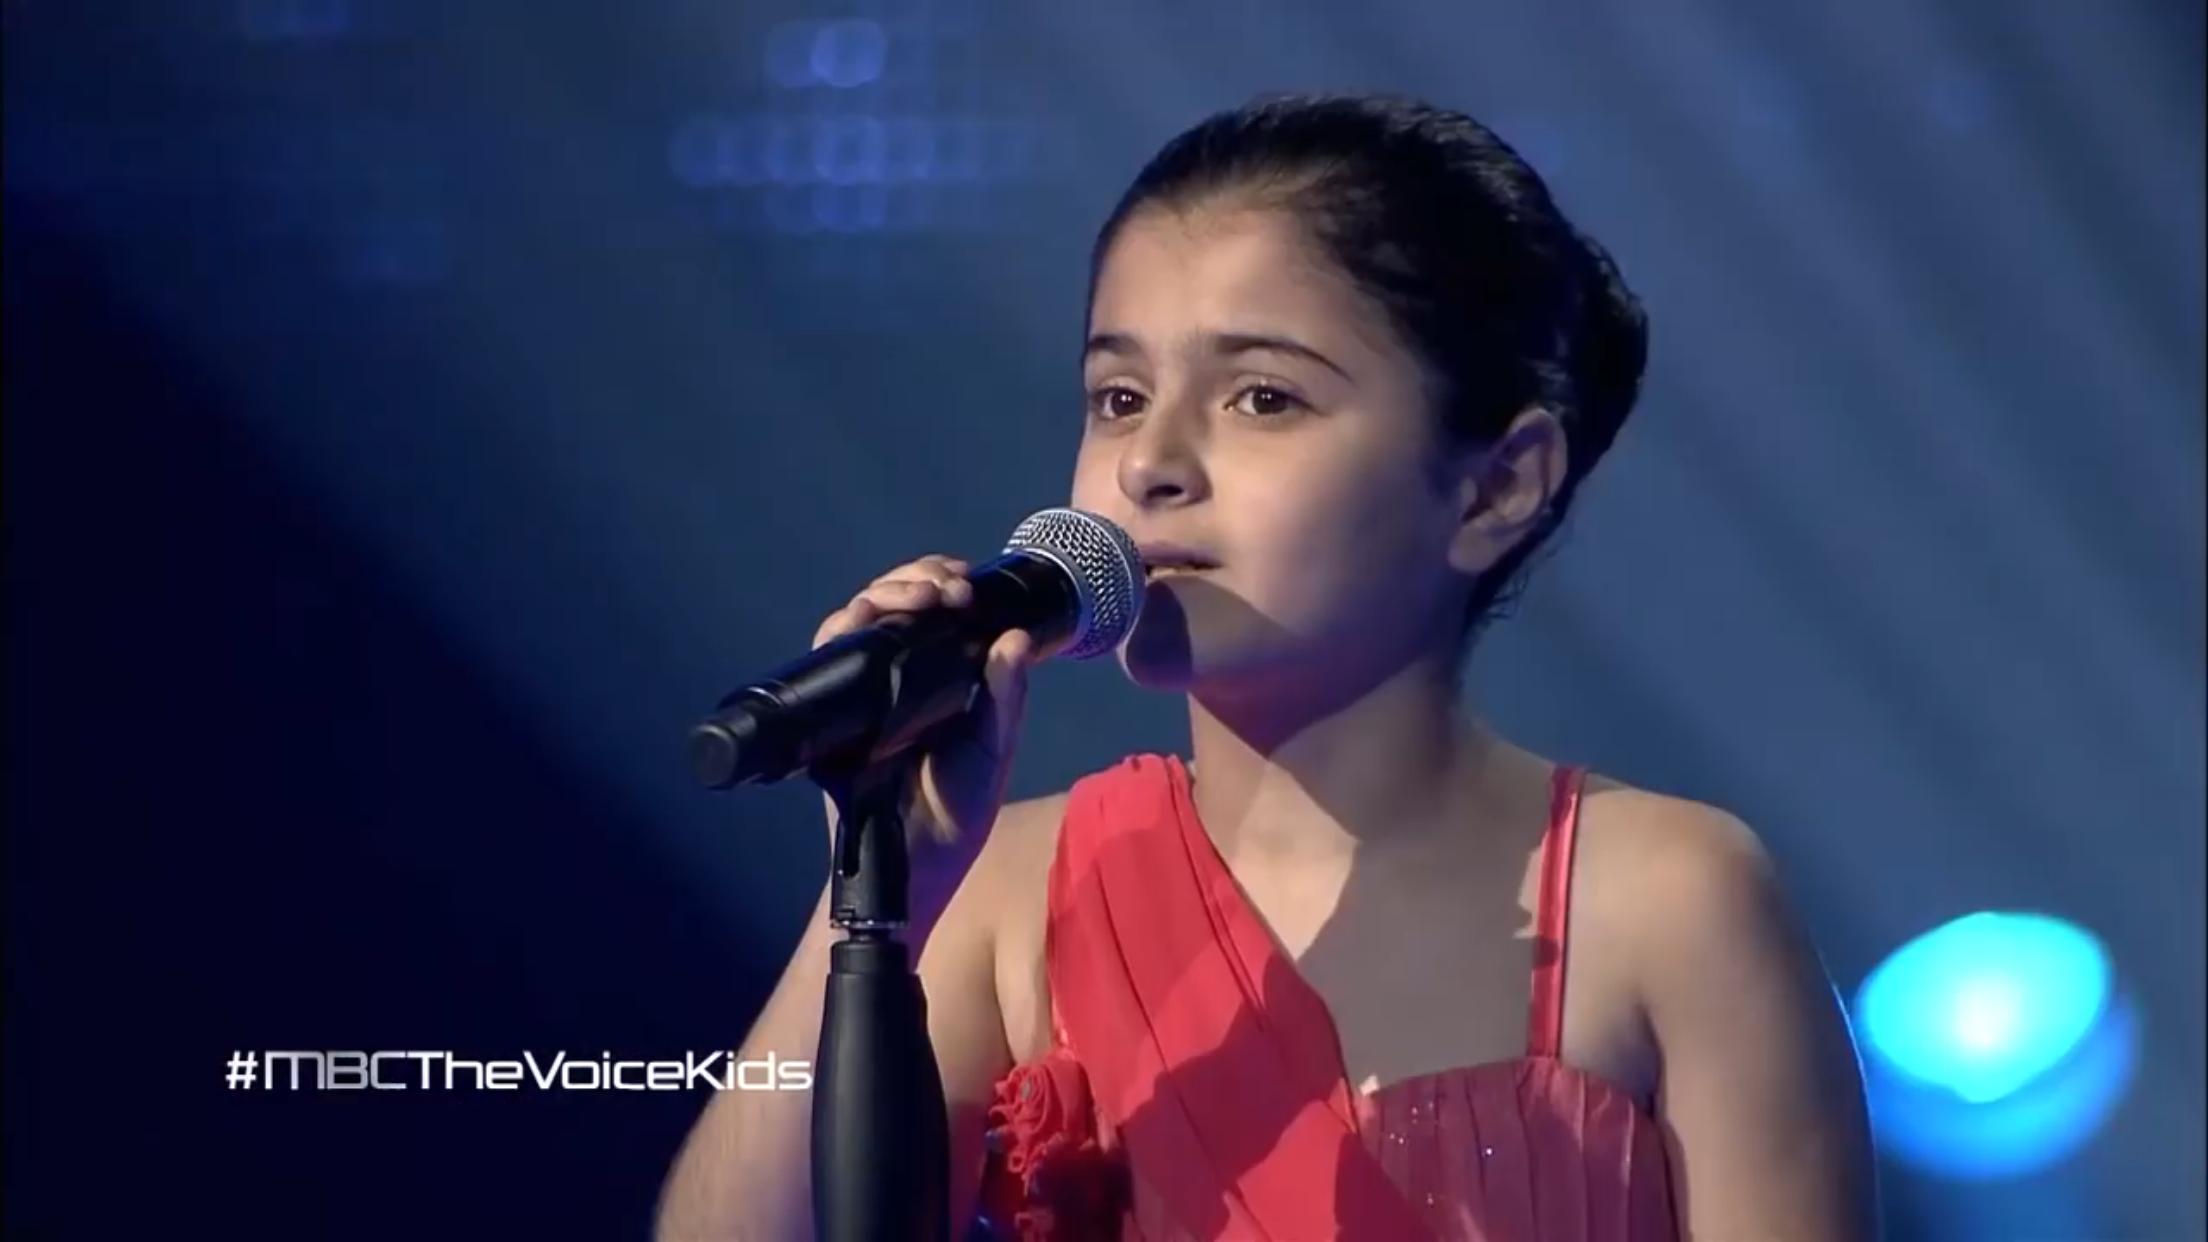 MBC TV gives Arab Kids a Voice – Brum2Jerusalem Blog